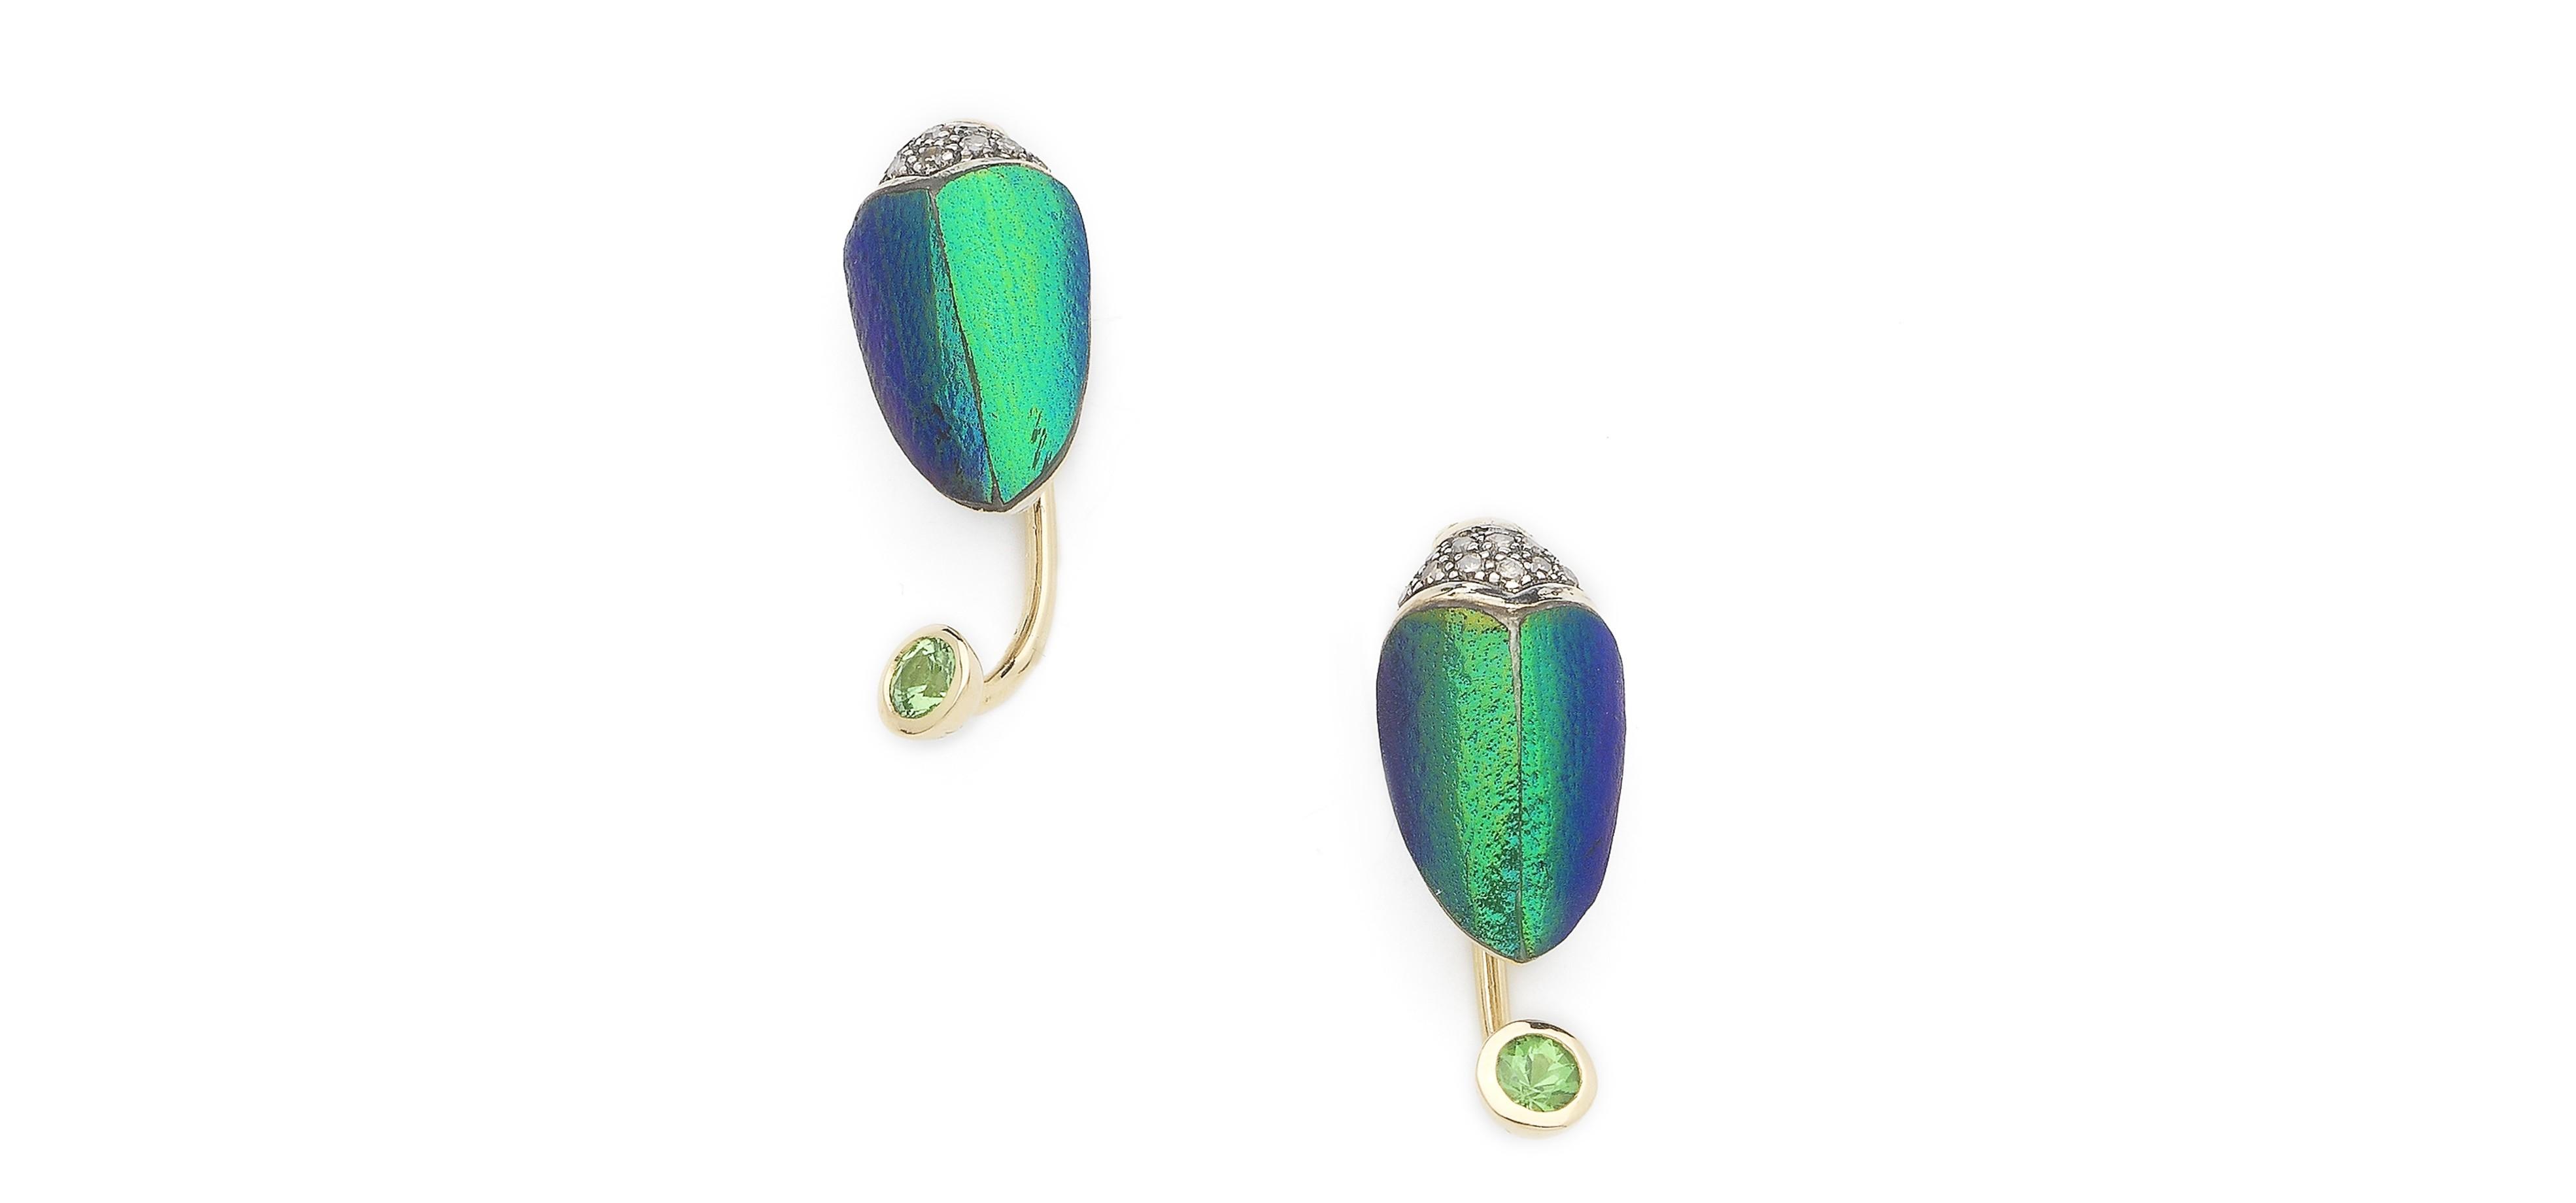 bibi-van-der-velden-scarab-collection-scarab-small-earrings-hanging-part-sterling-silver-18-ct-yellow-gold-scarab-wings-green-tsavorites-white-diamonds-zoom